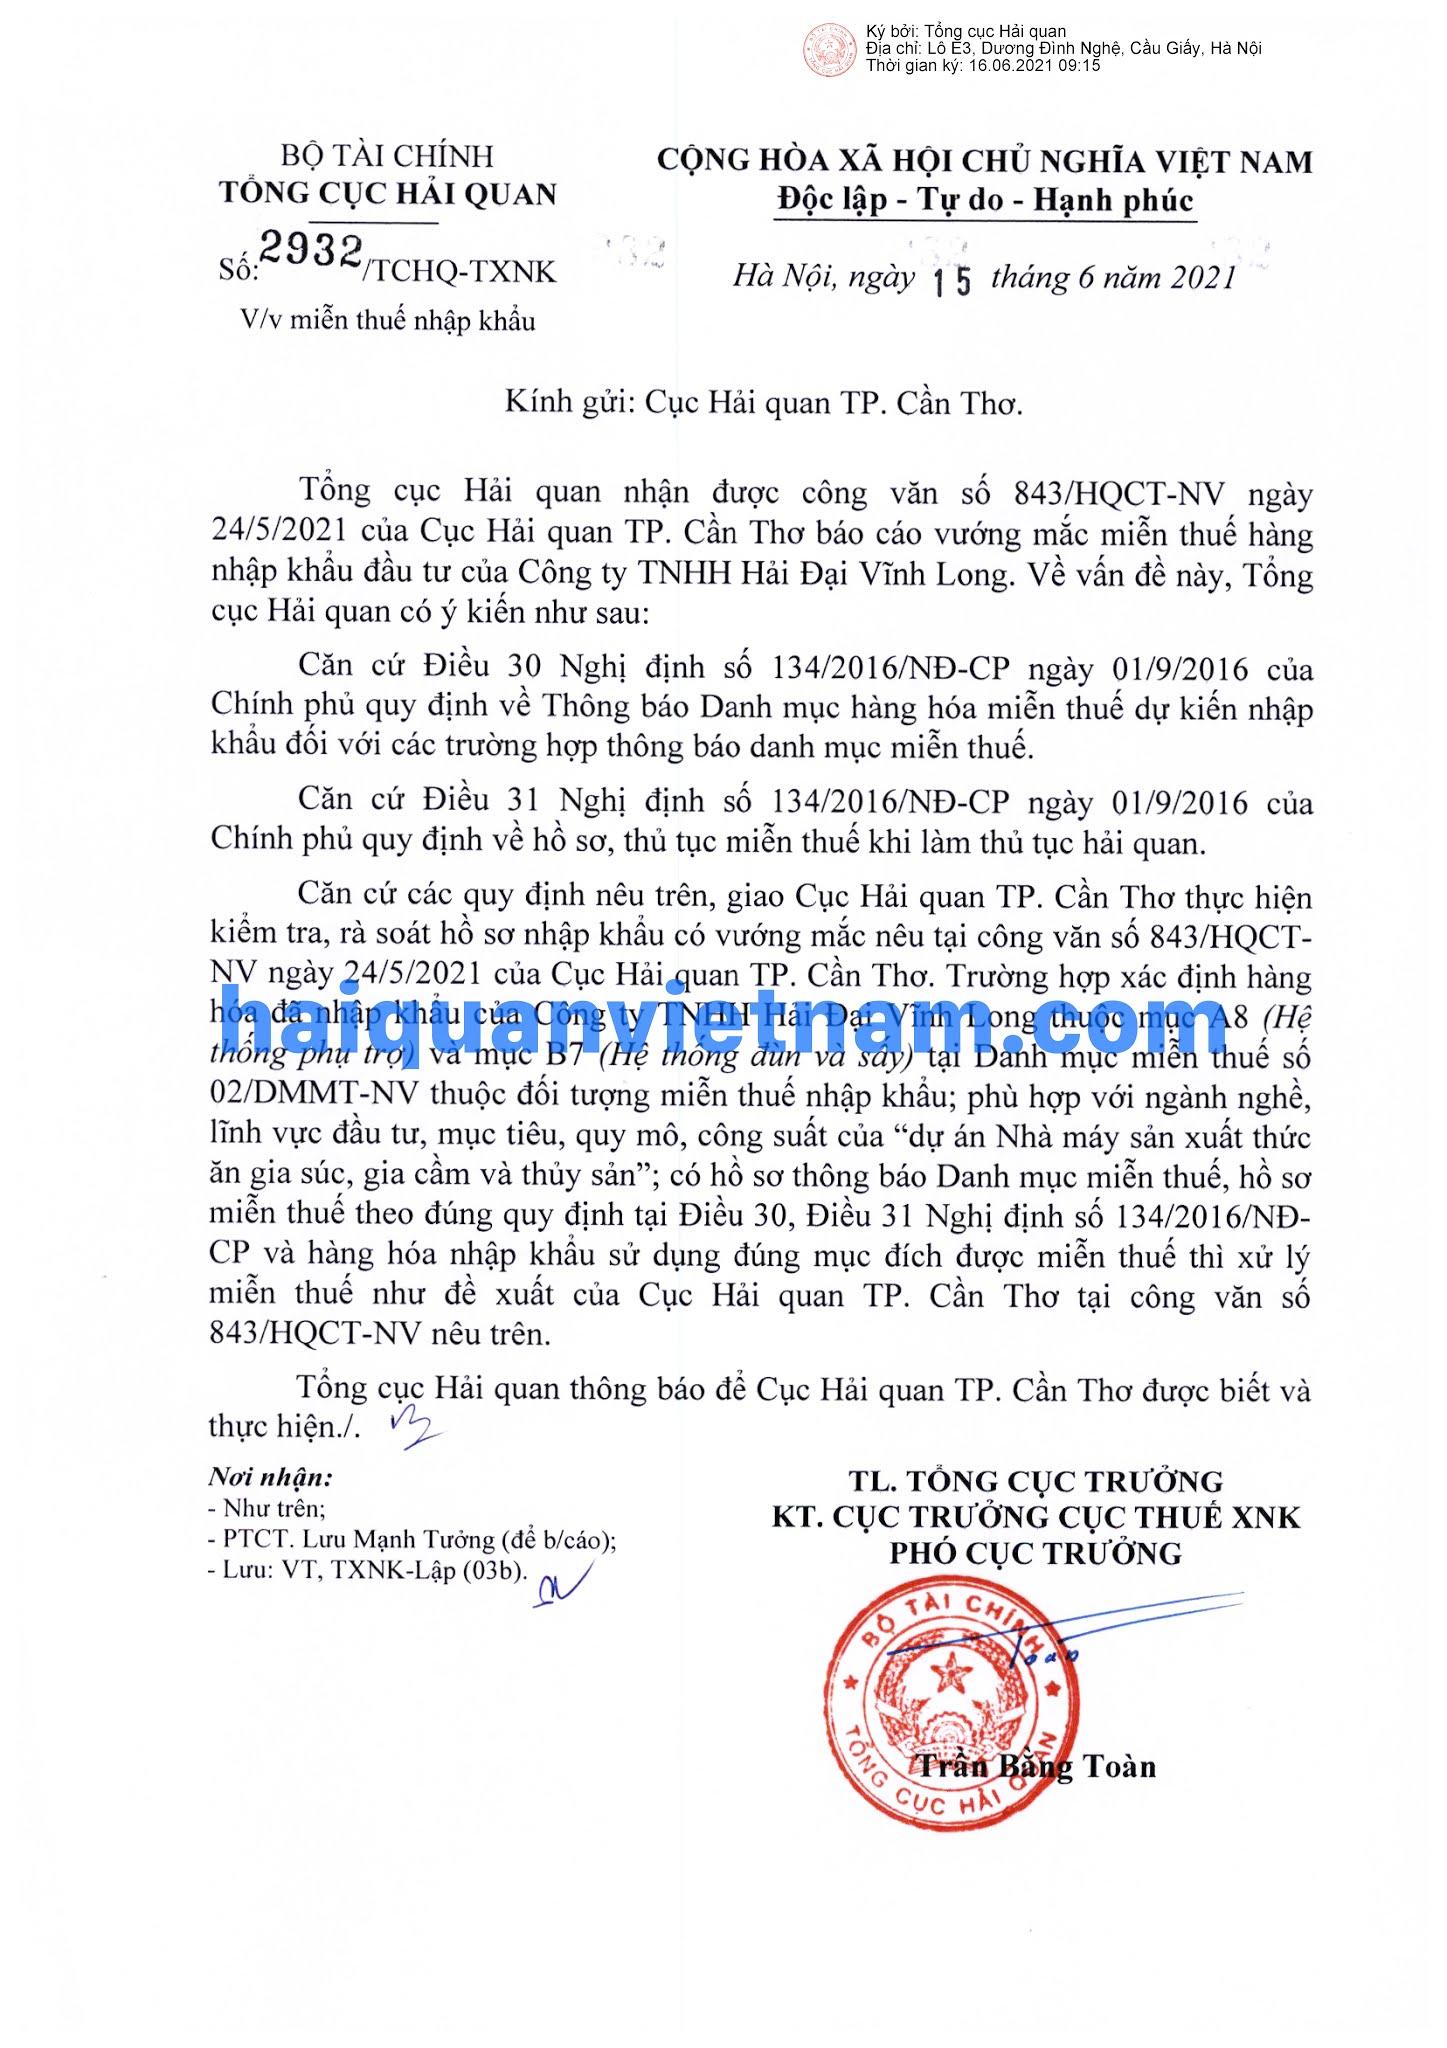 [Image: 210615_2932_TCHQ-TXNK_haiquanvietnam_01.jpg]